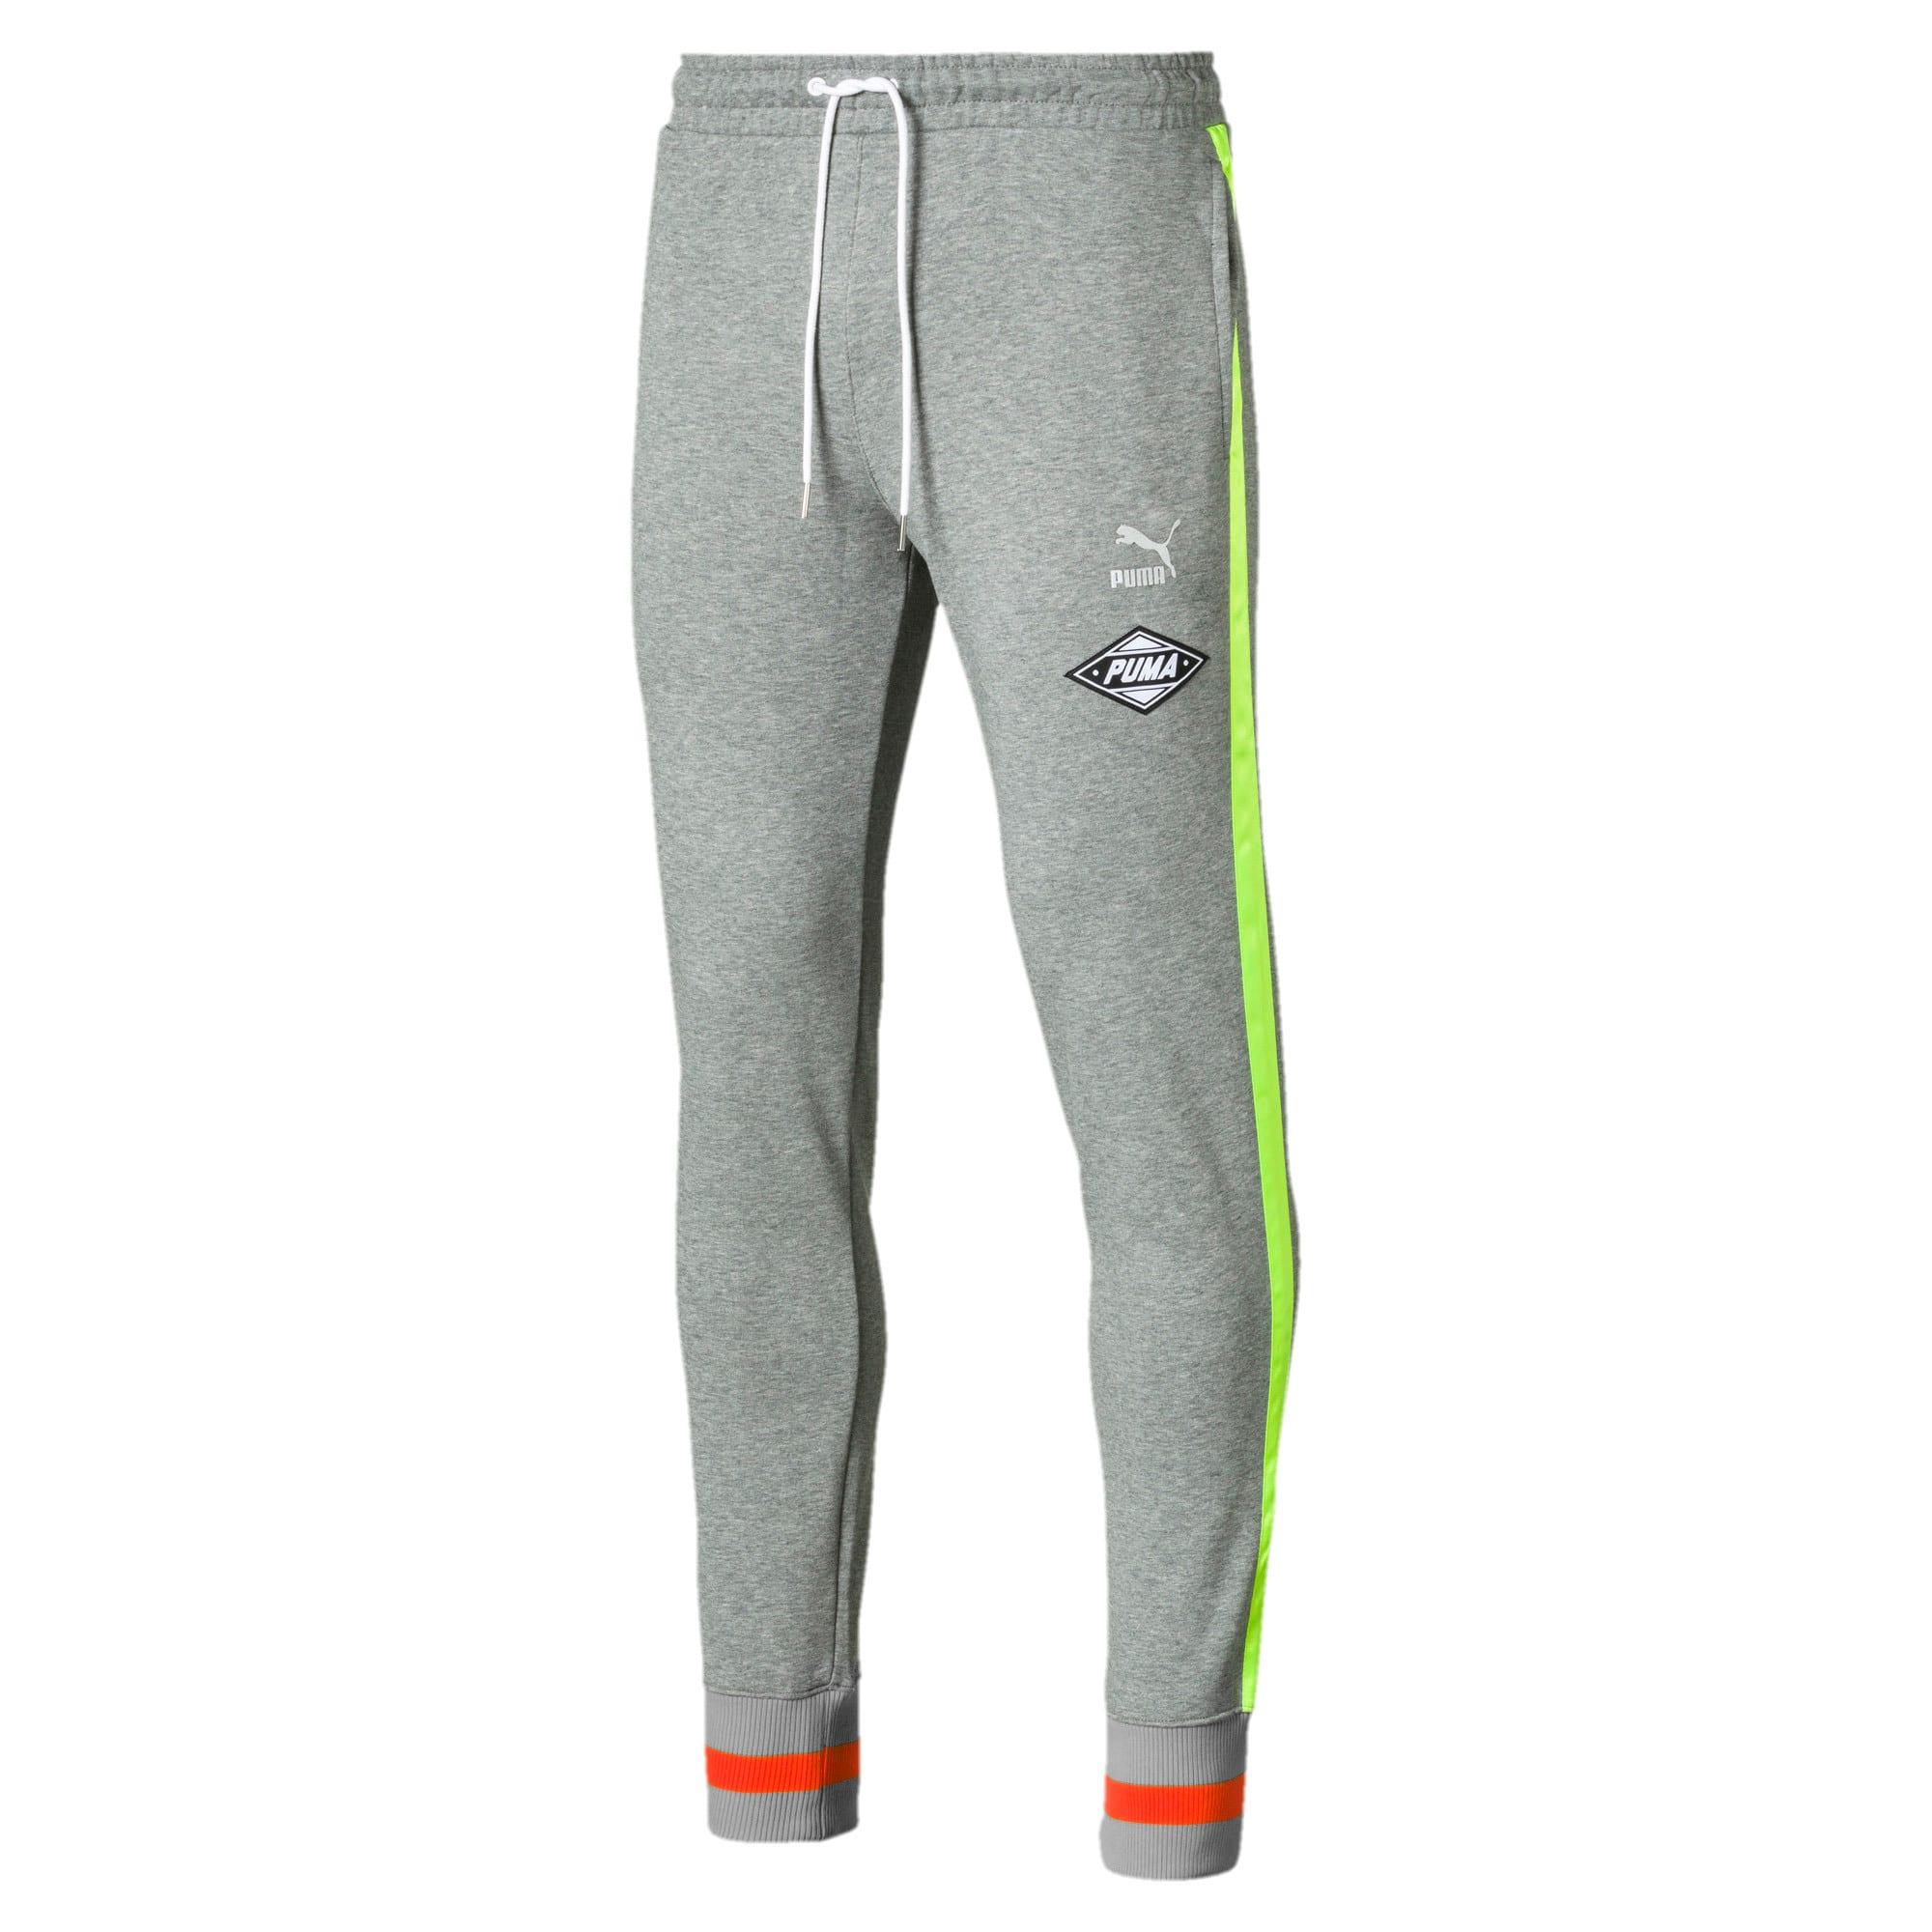 Thumbnail 1 of luXTG Men's Cuffed Sweatpants, Medium Gray Heather, medium